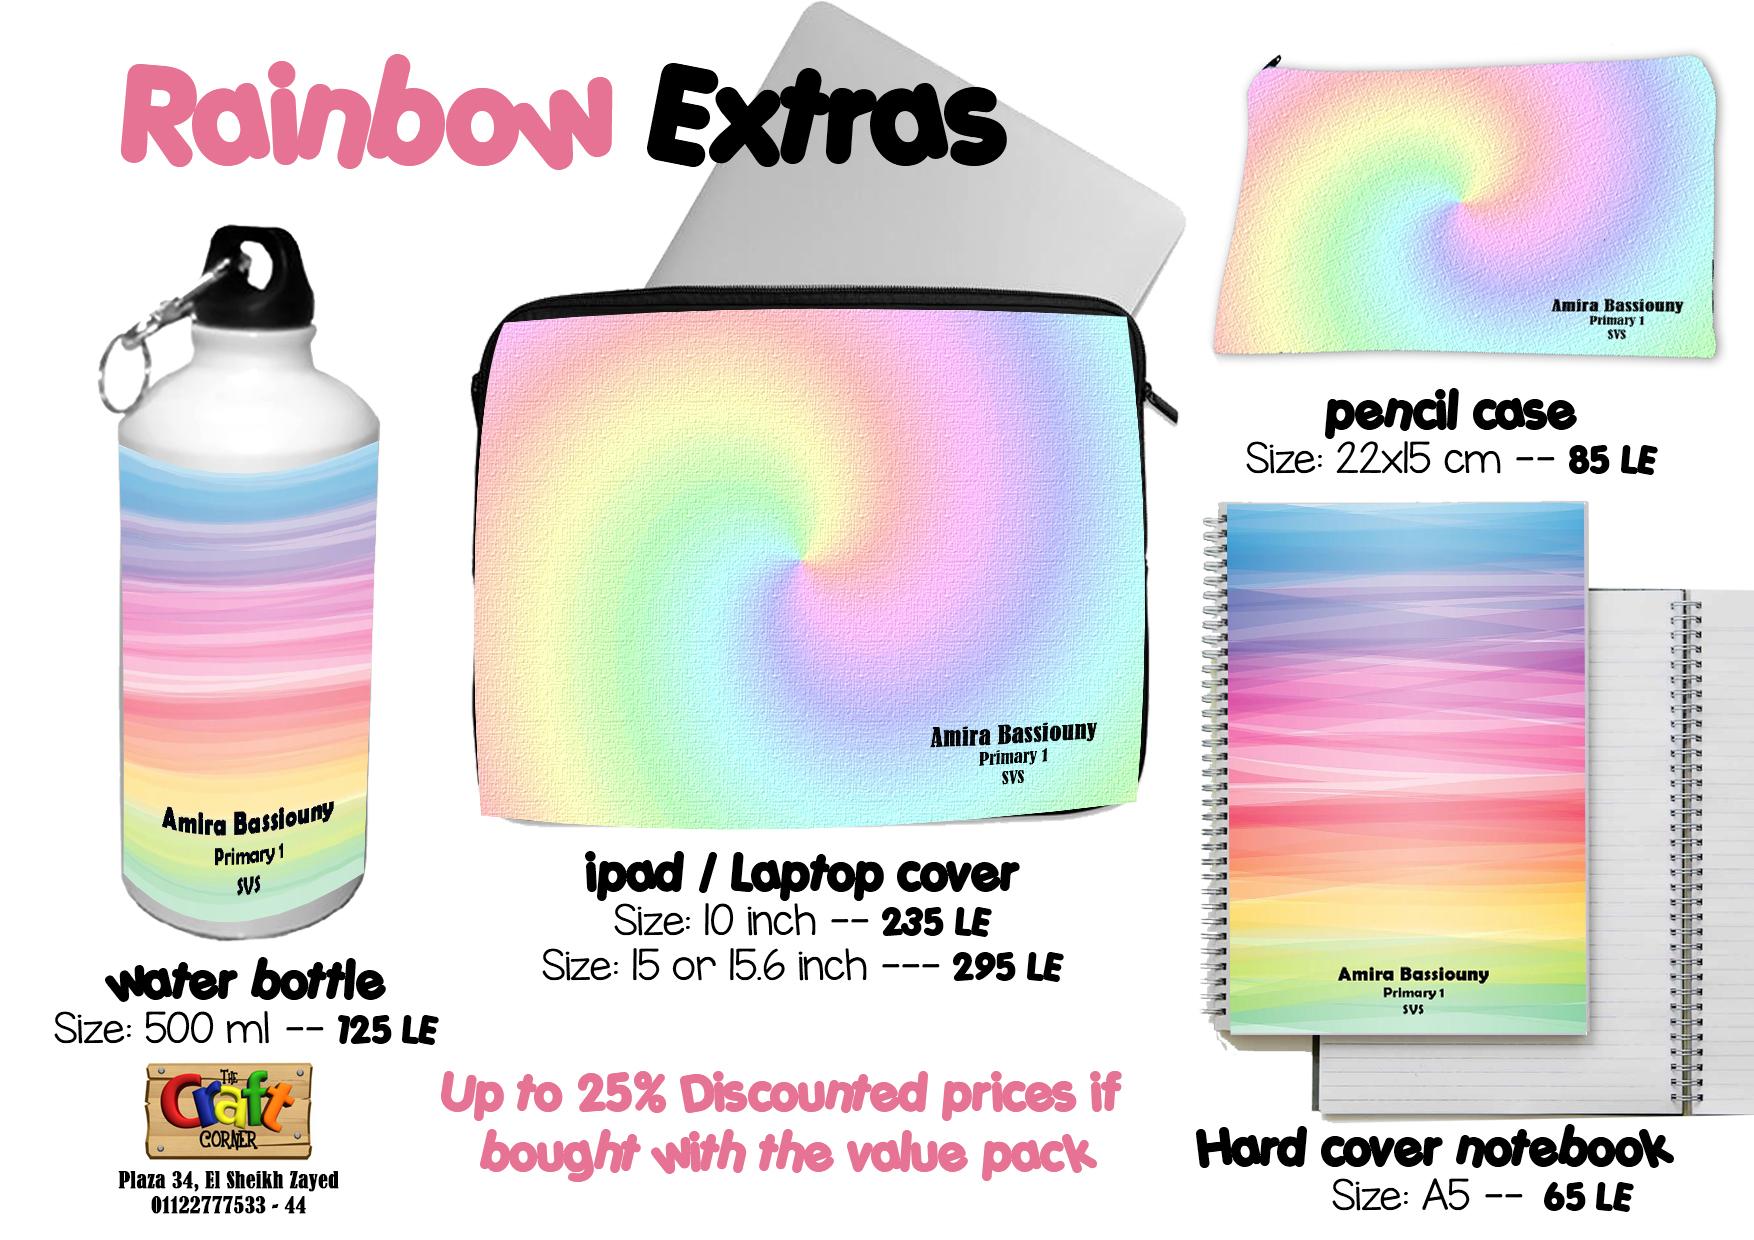 rainbow Extras